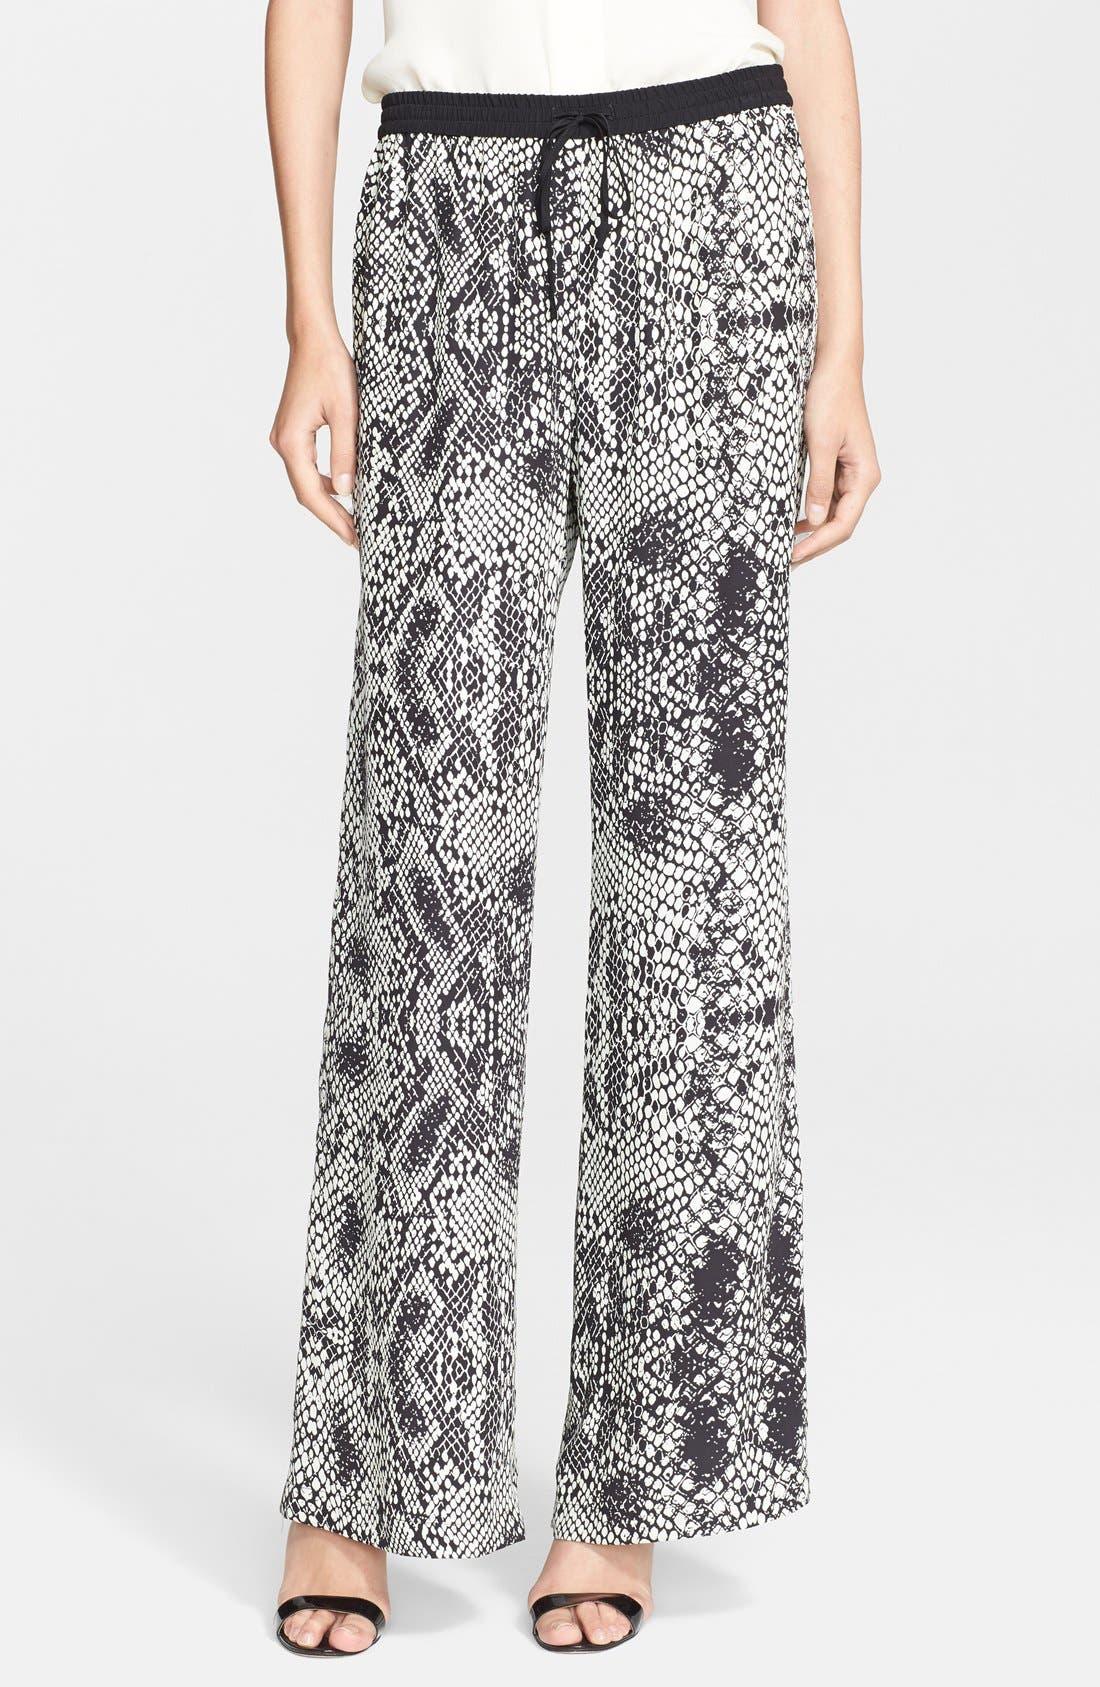 Alternate Image 1 Selected - Parker 'Nile' Print Wide Leg Silk Pants